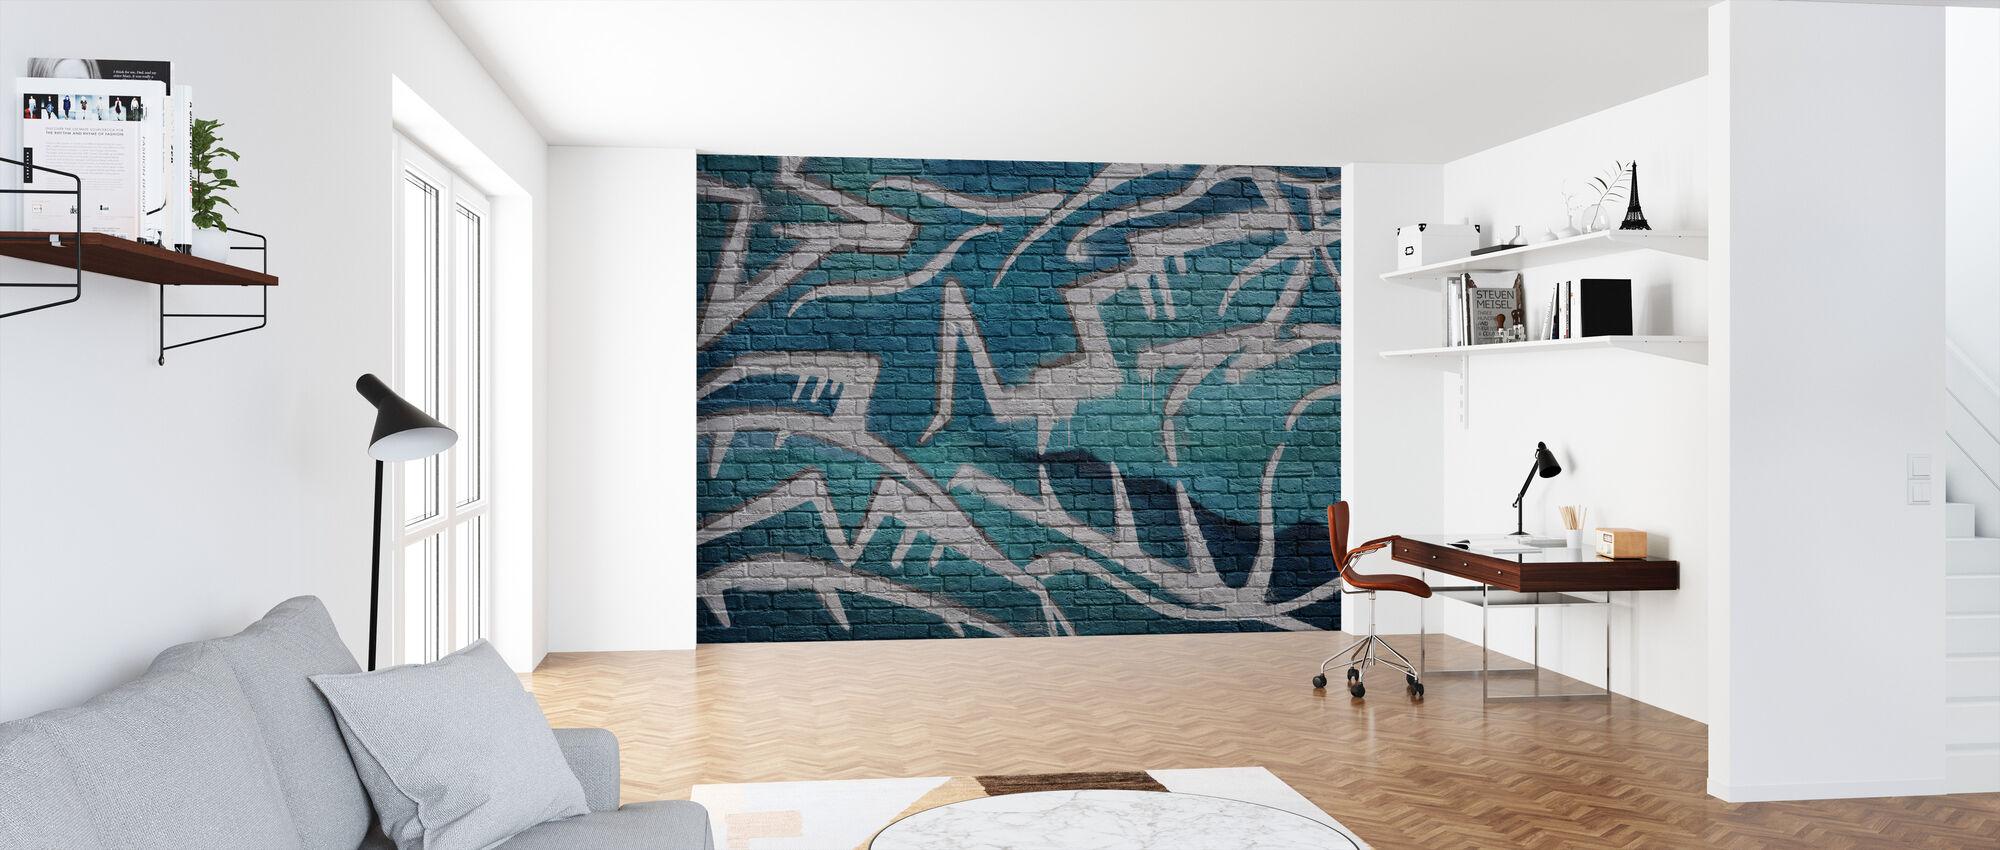 Brick Wall Graffiti - Turquoise - Wallpaper - Office